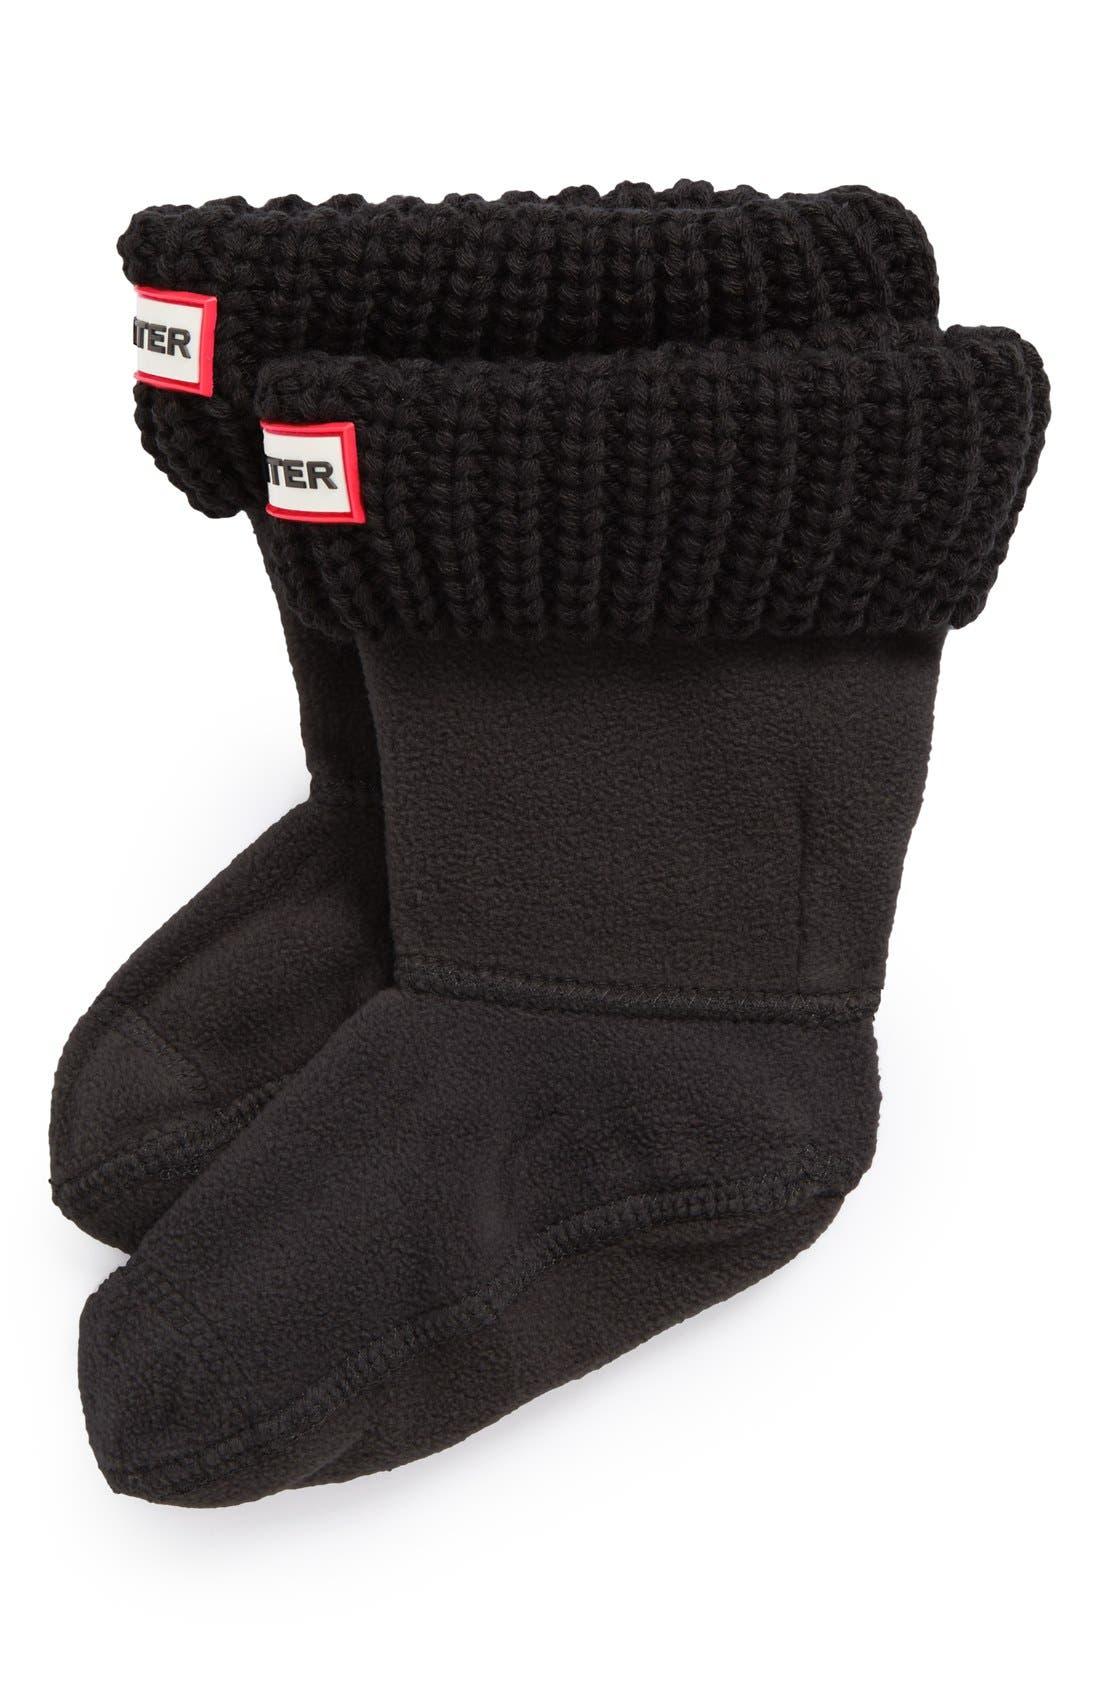 Toddler Girls Hunter Cardigan Knit Cuff Welly Boot Socks Size 810  Black